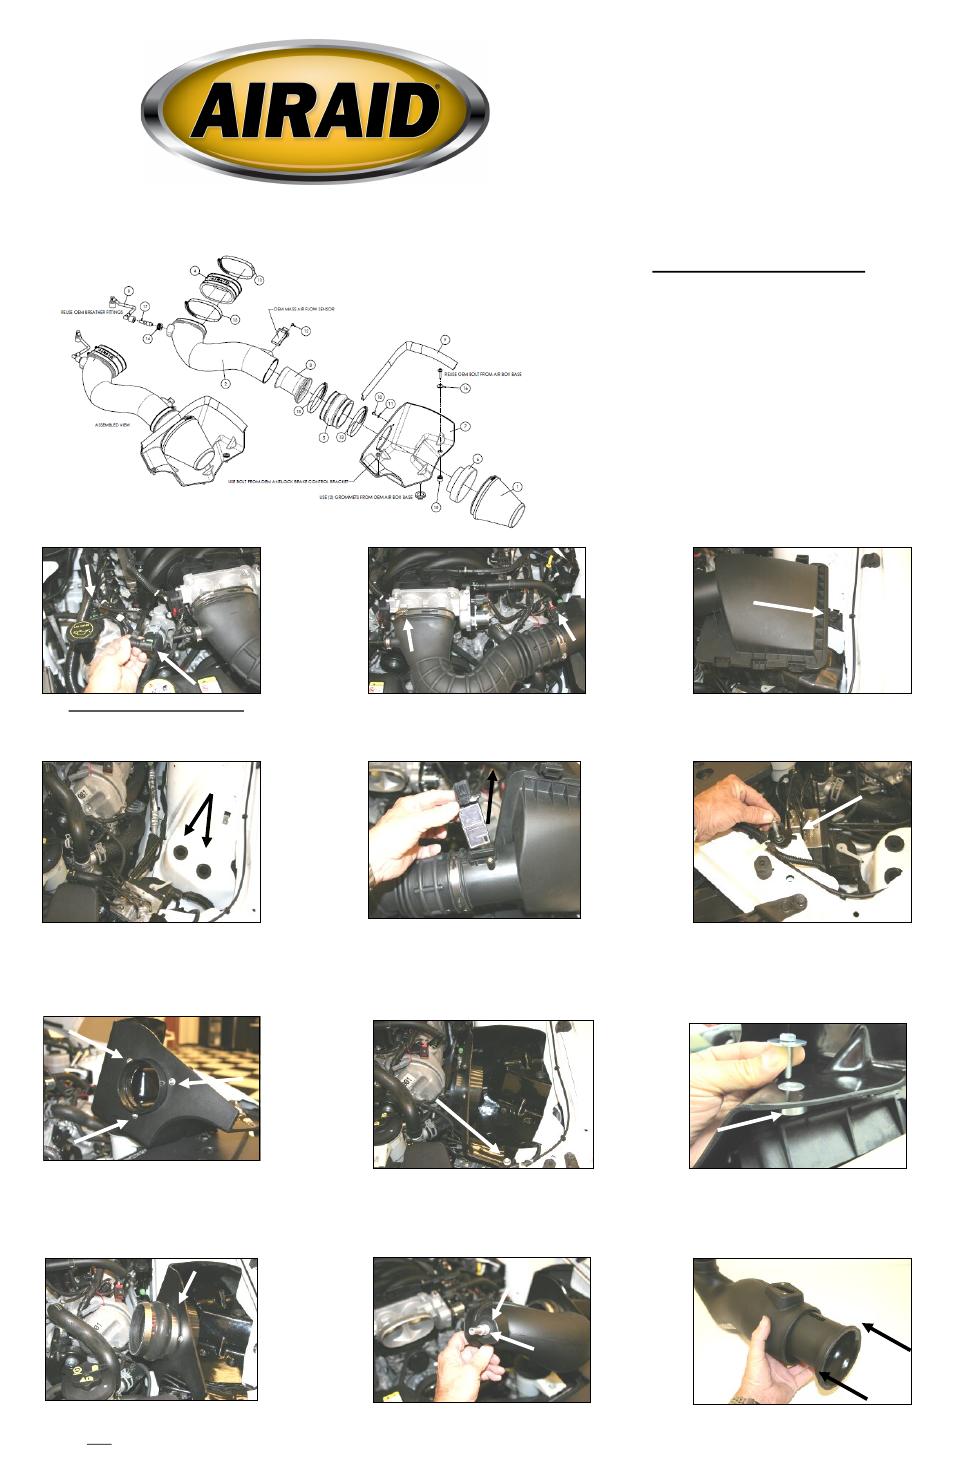 airaid 450 172 user manual 2 pages also for 451 172 452 172 rh manualsdir com Manuals in PDF User Manual PDF